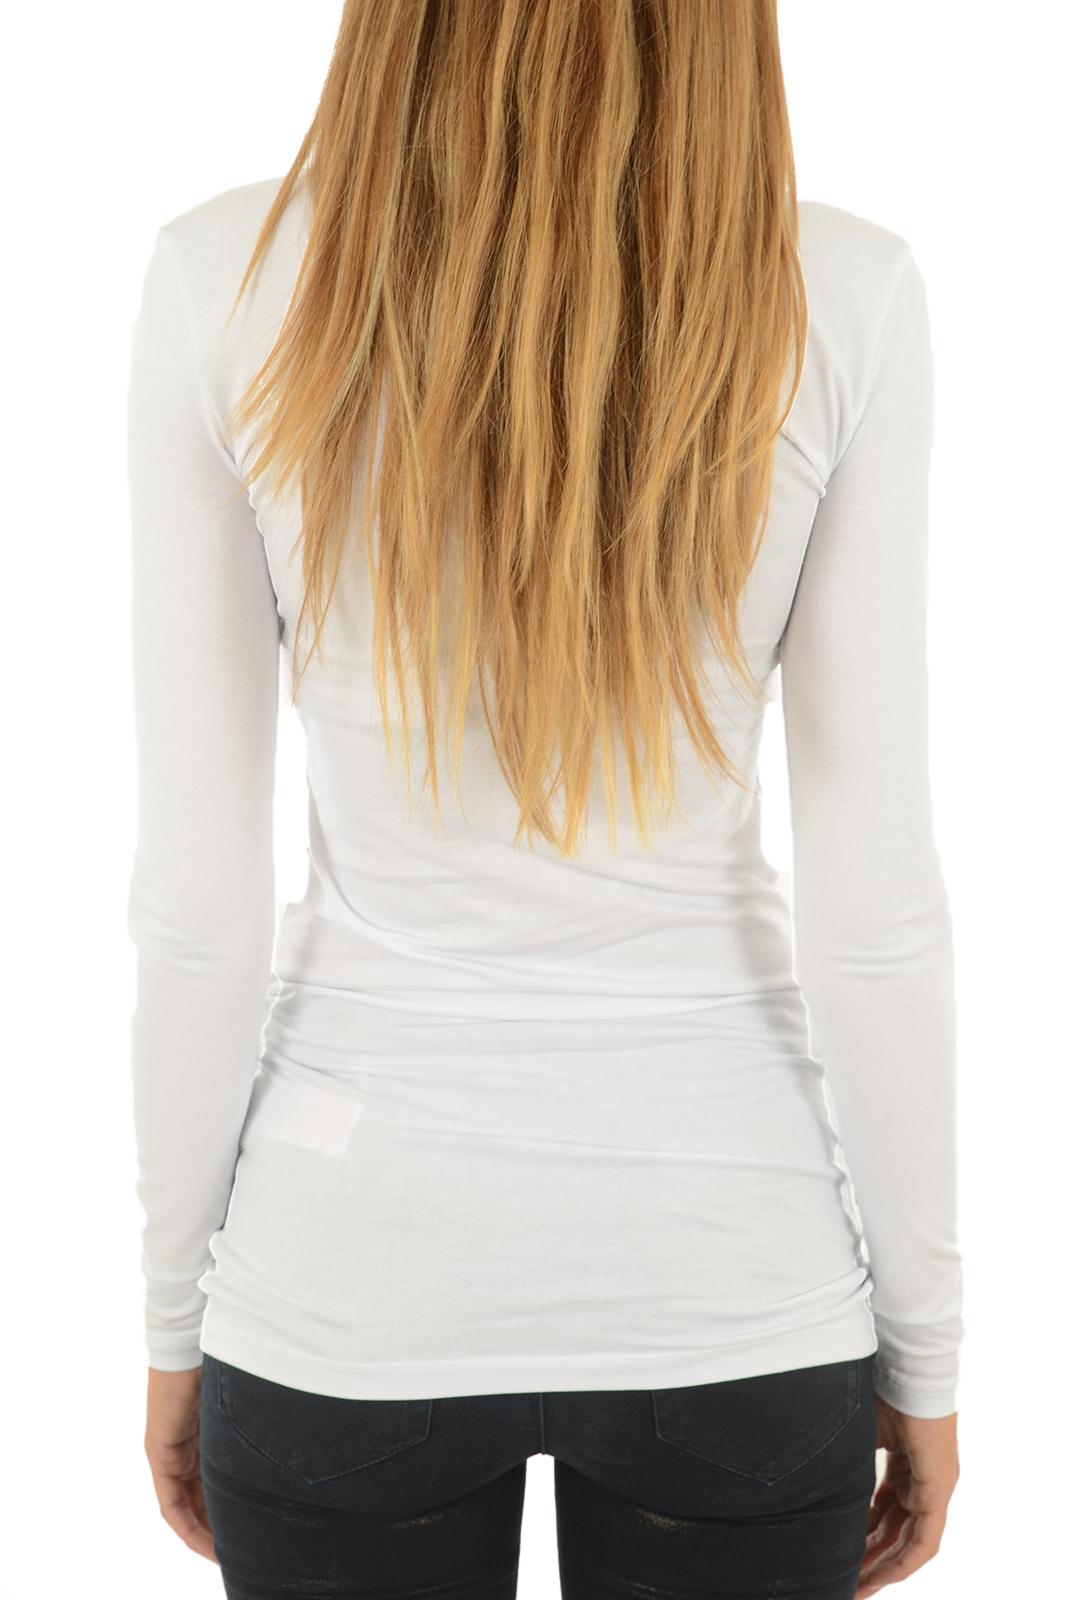 Tee shirt manches longues  Vero moda MAXI MY LS SOFT LONG U-NECK BRIGHT WHITE